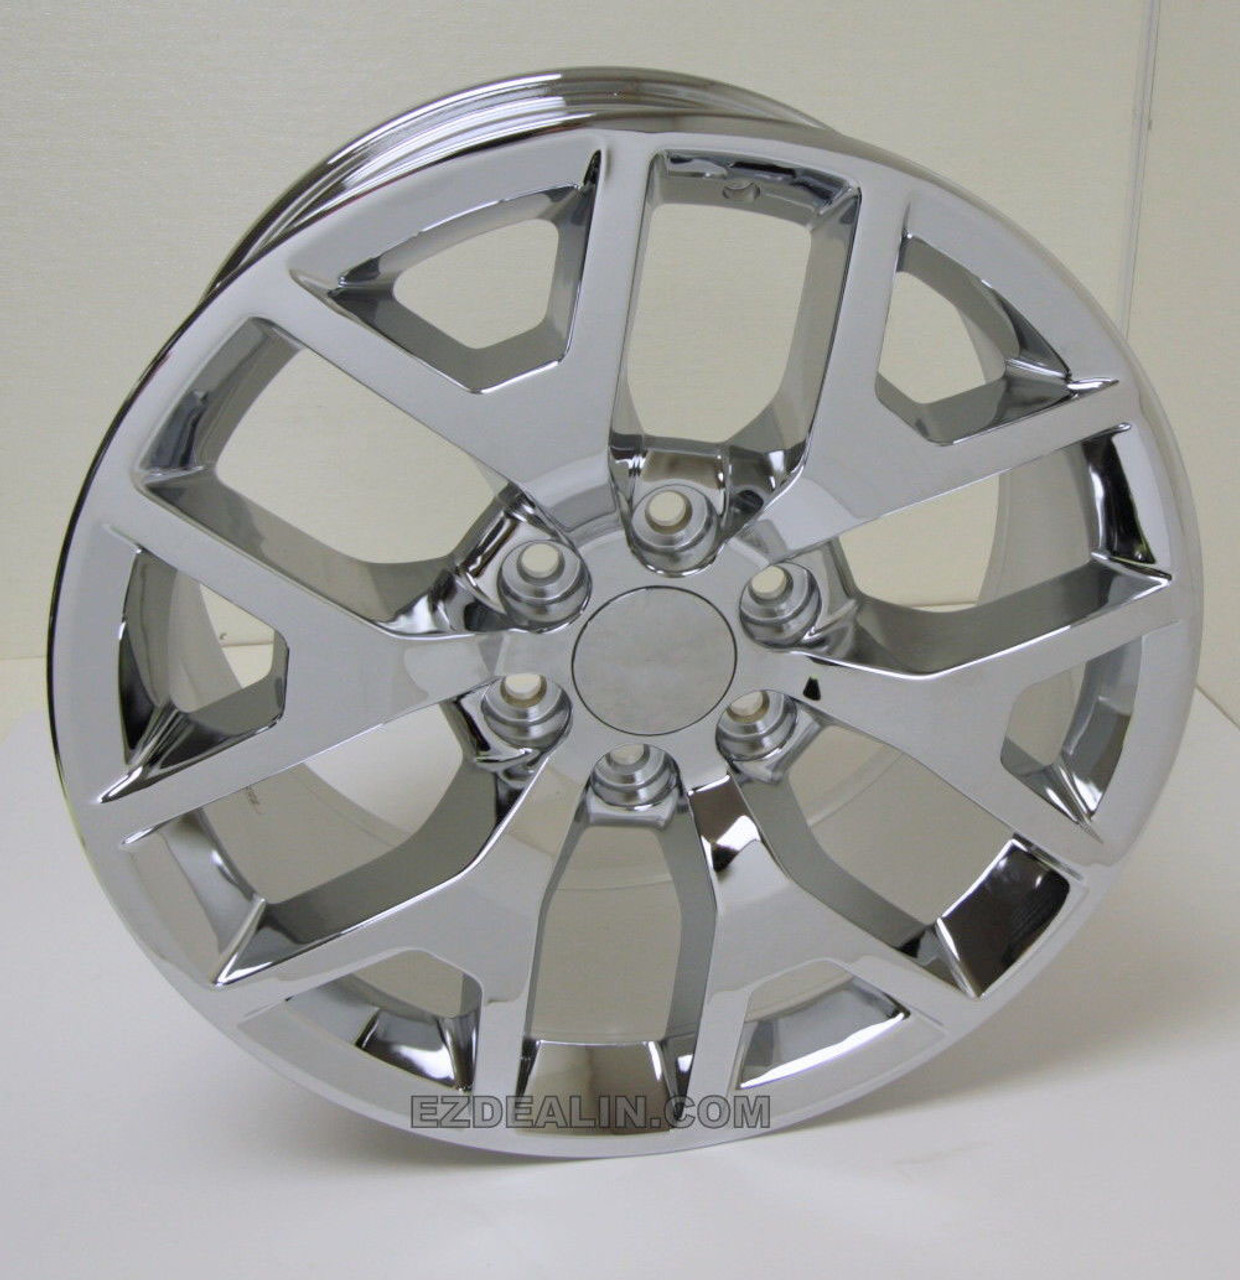 "Chrome 20"" Honeycomb Wheels for GMC Sierra, Yukon, Denali - New Set of 4"